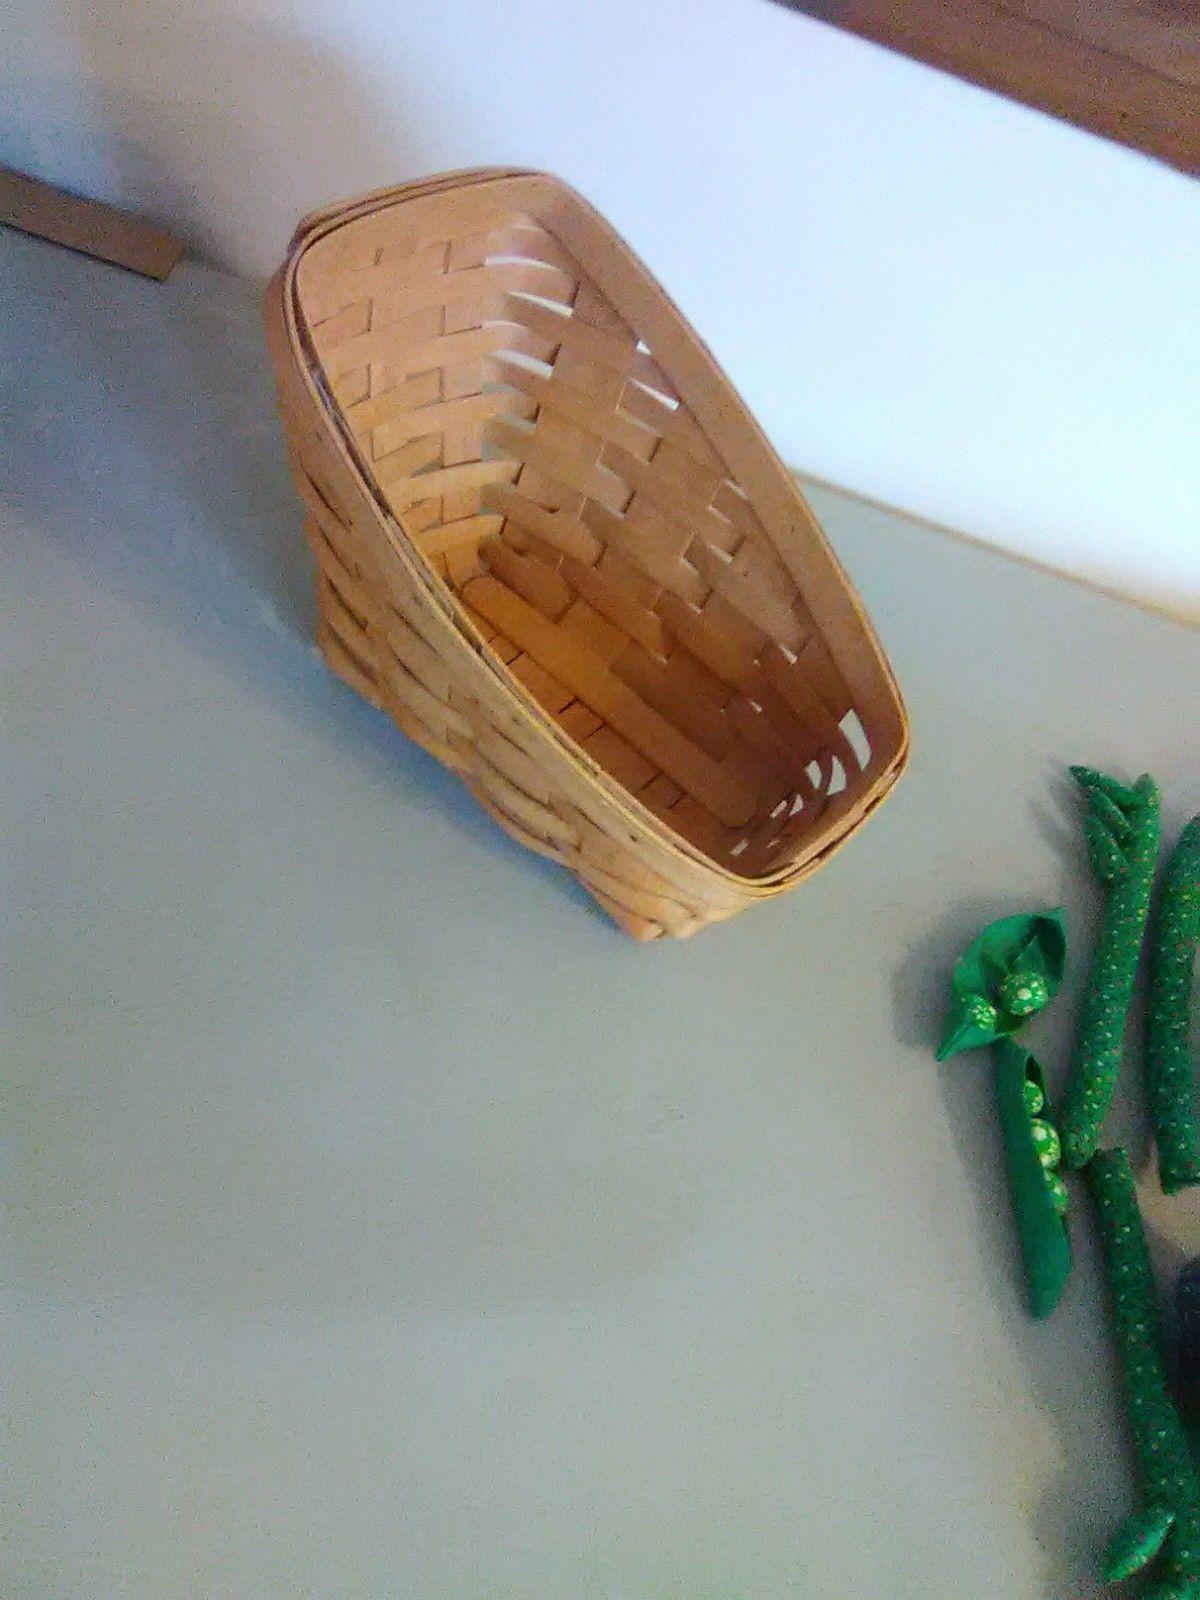 Longaberger Vegetable Sleigh Basket 1995  - Hand sewn vegetables image 6